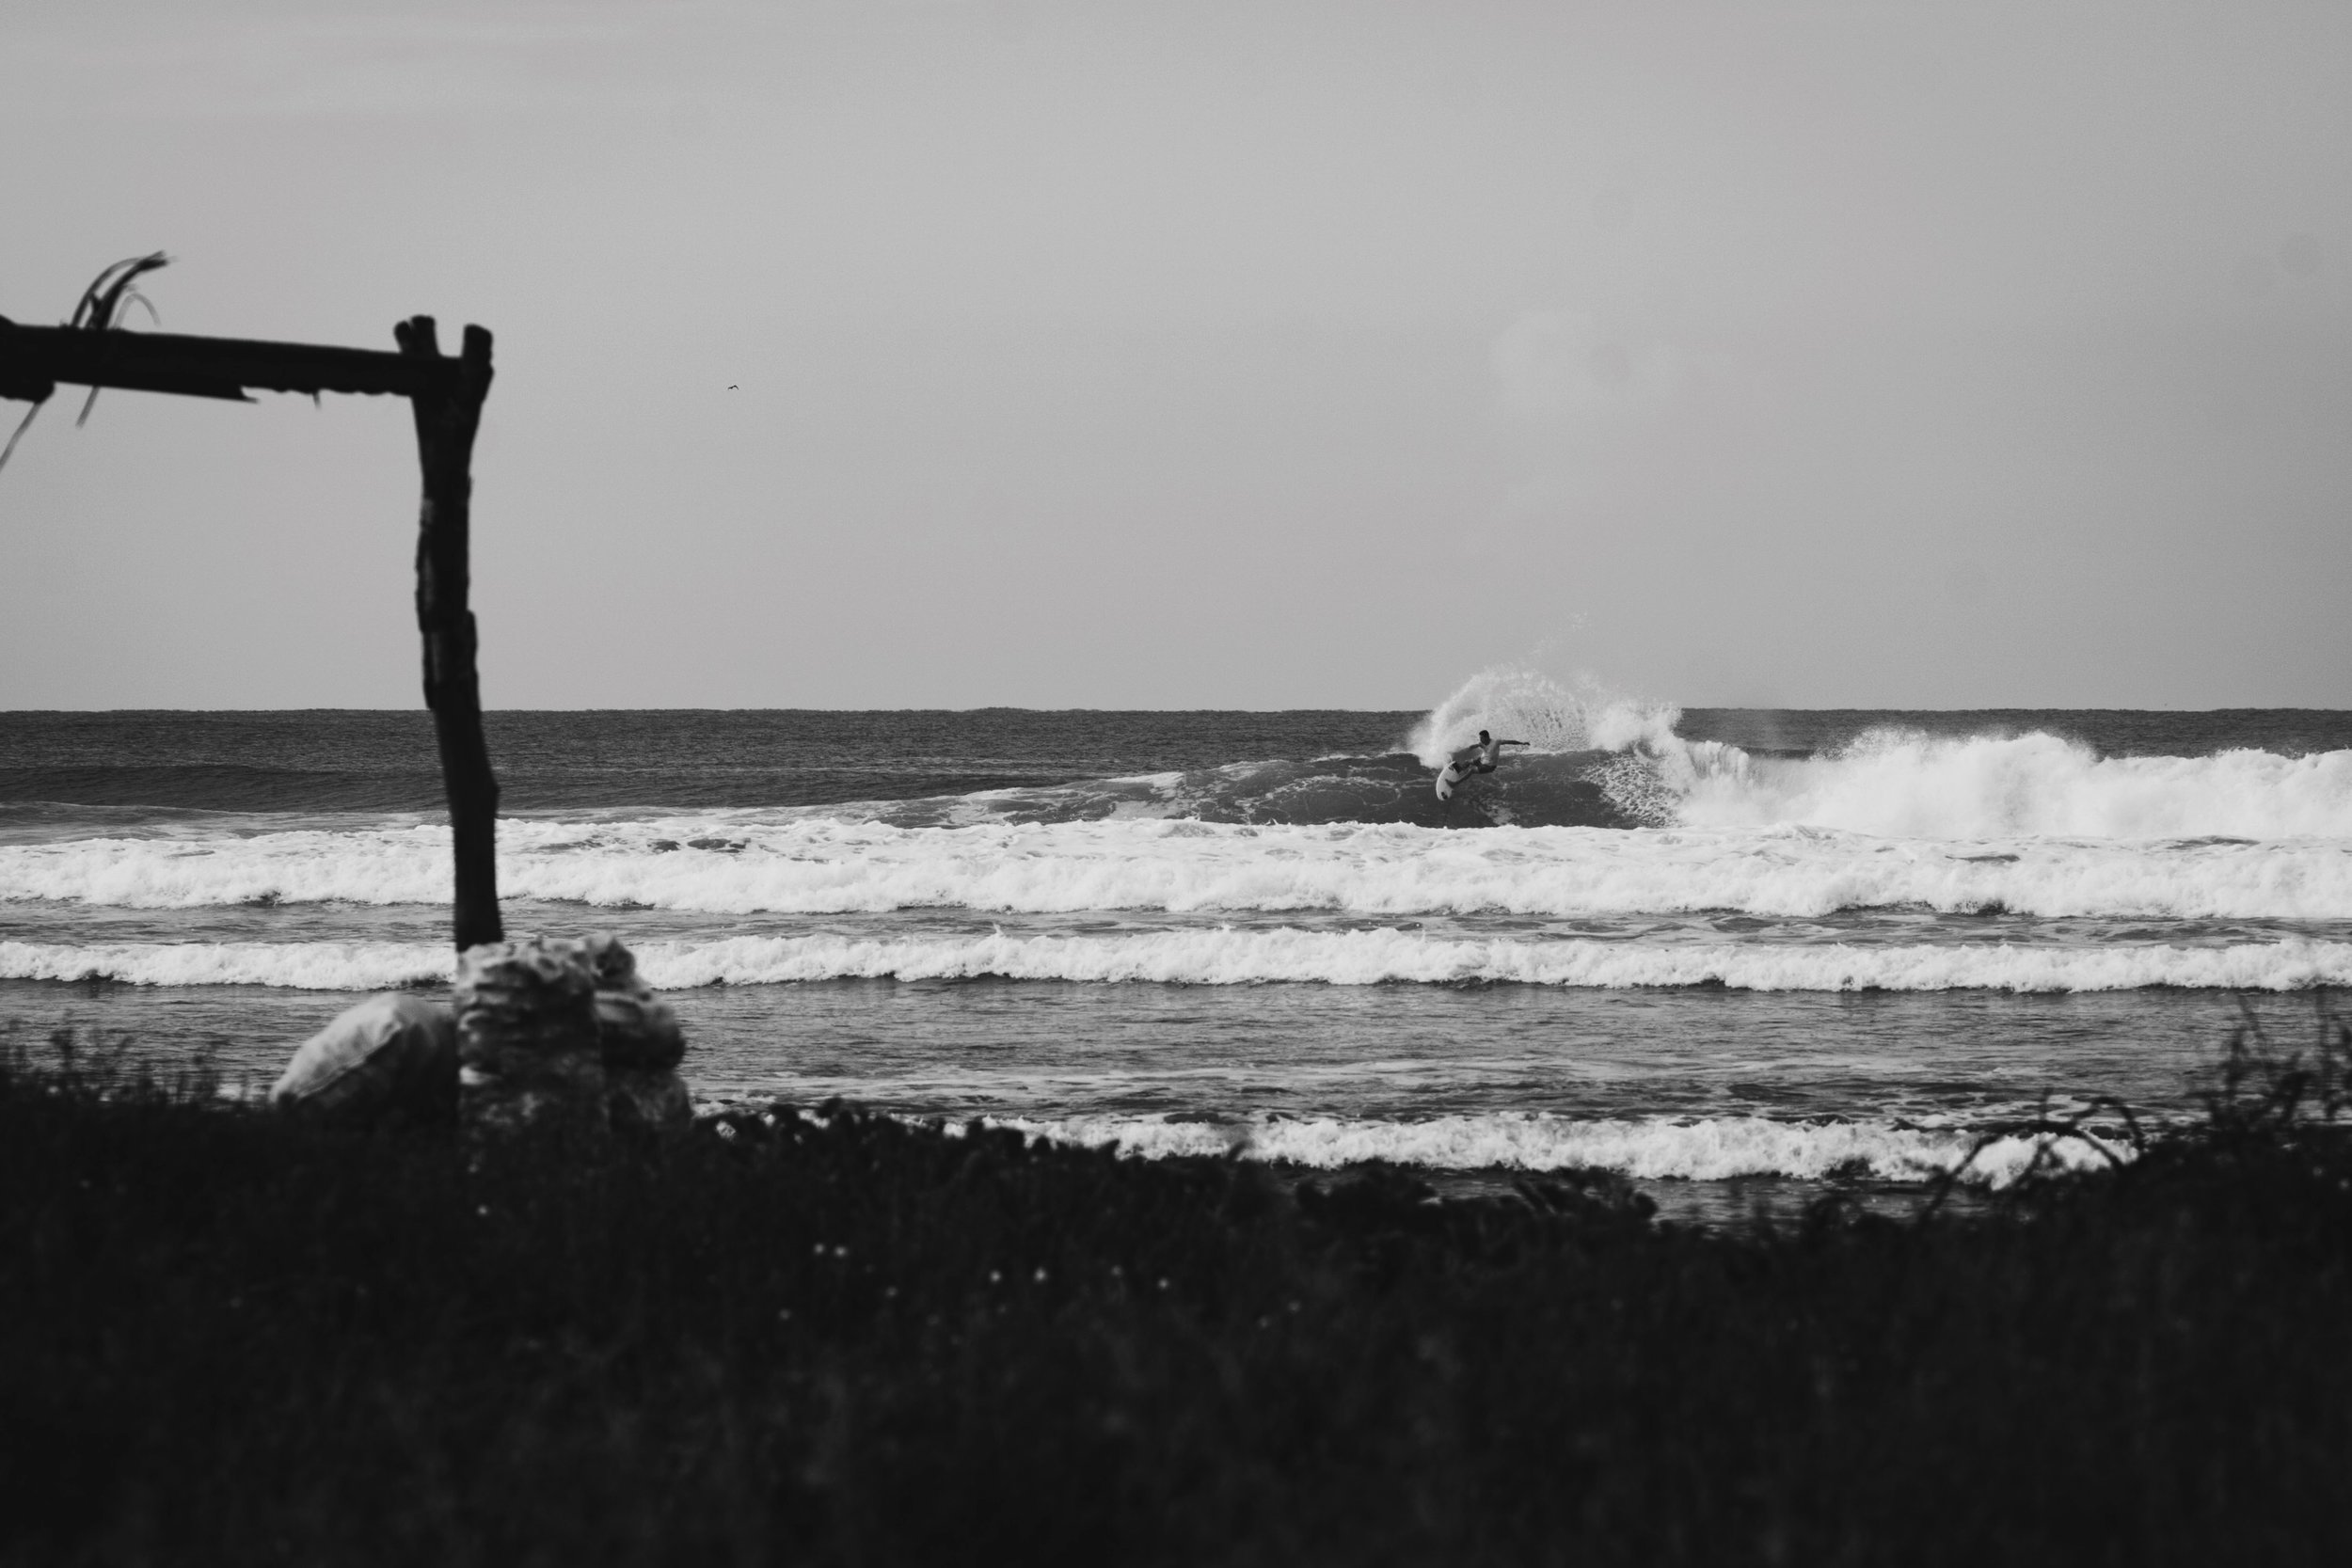 Tristan-Guibald-Surf-México-Sayulita-Pascuales-Zihuatanejo-Fotografía-Heiko-Bothe-6.JPG